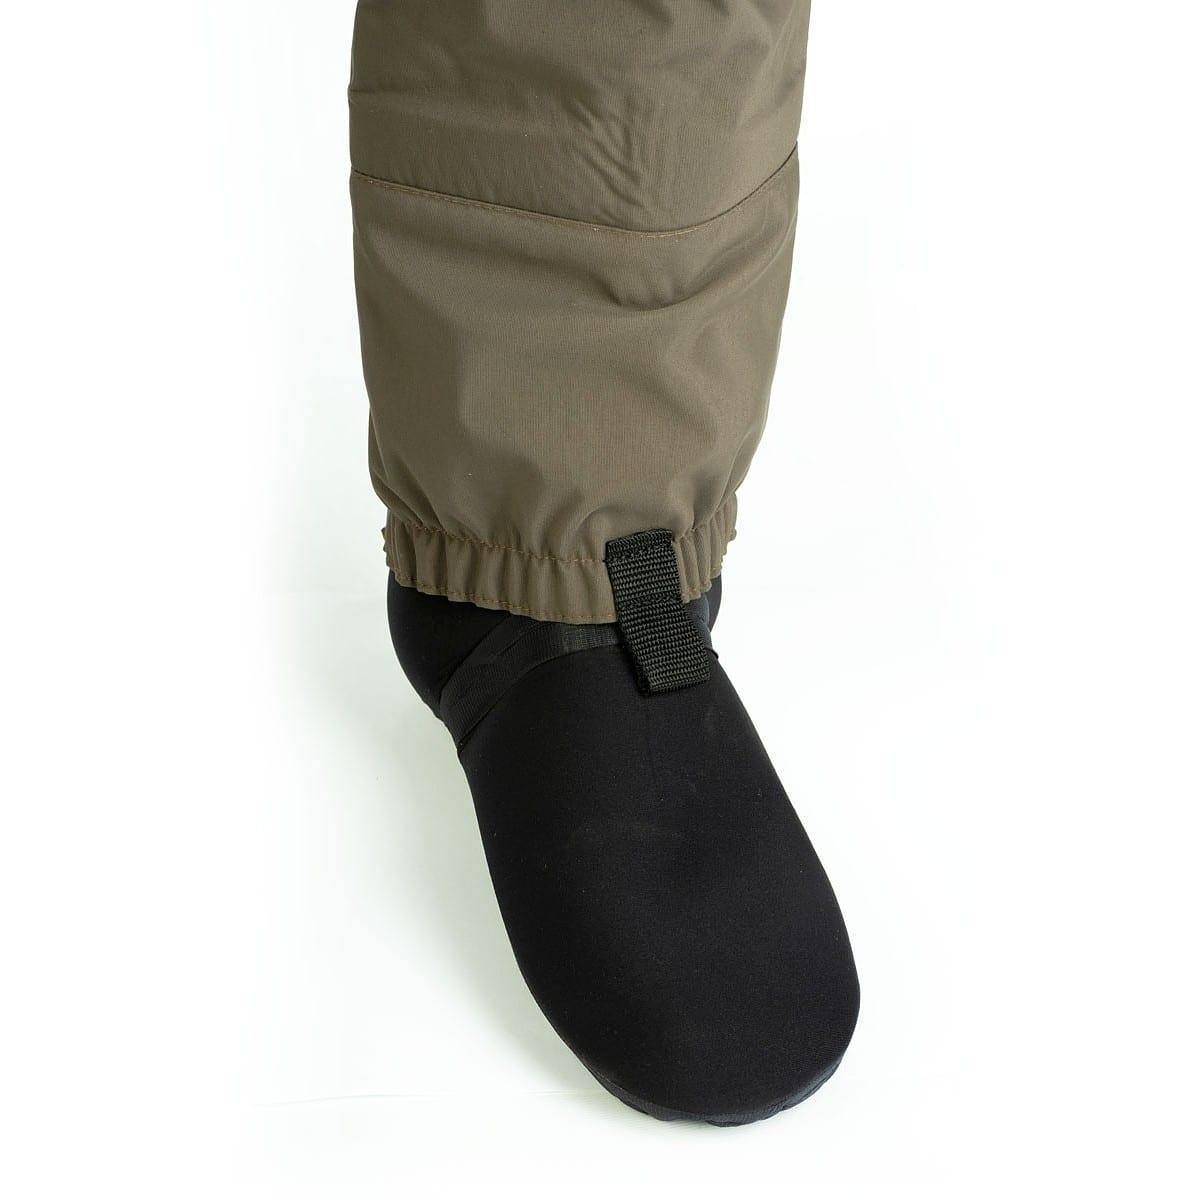 Spodnie Z Materialu Oddychajacego Z Neoprenowa Skarpeta Ab Tuy (5)